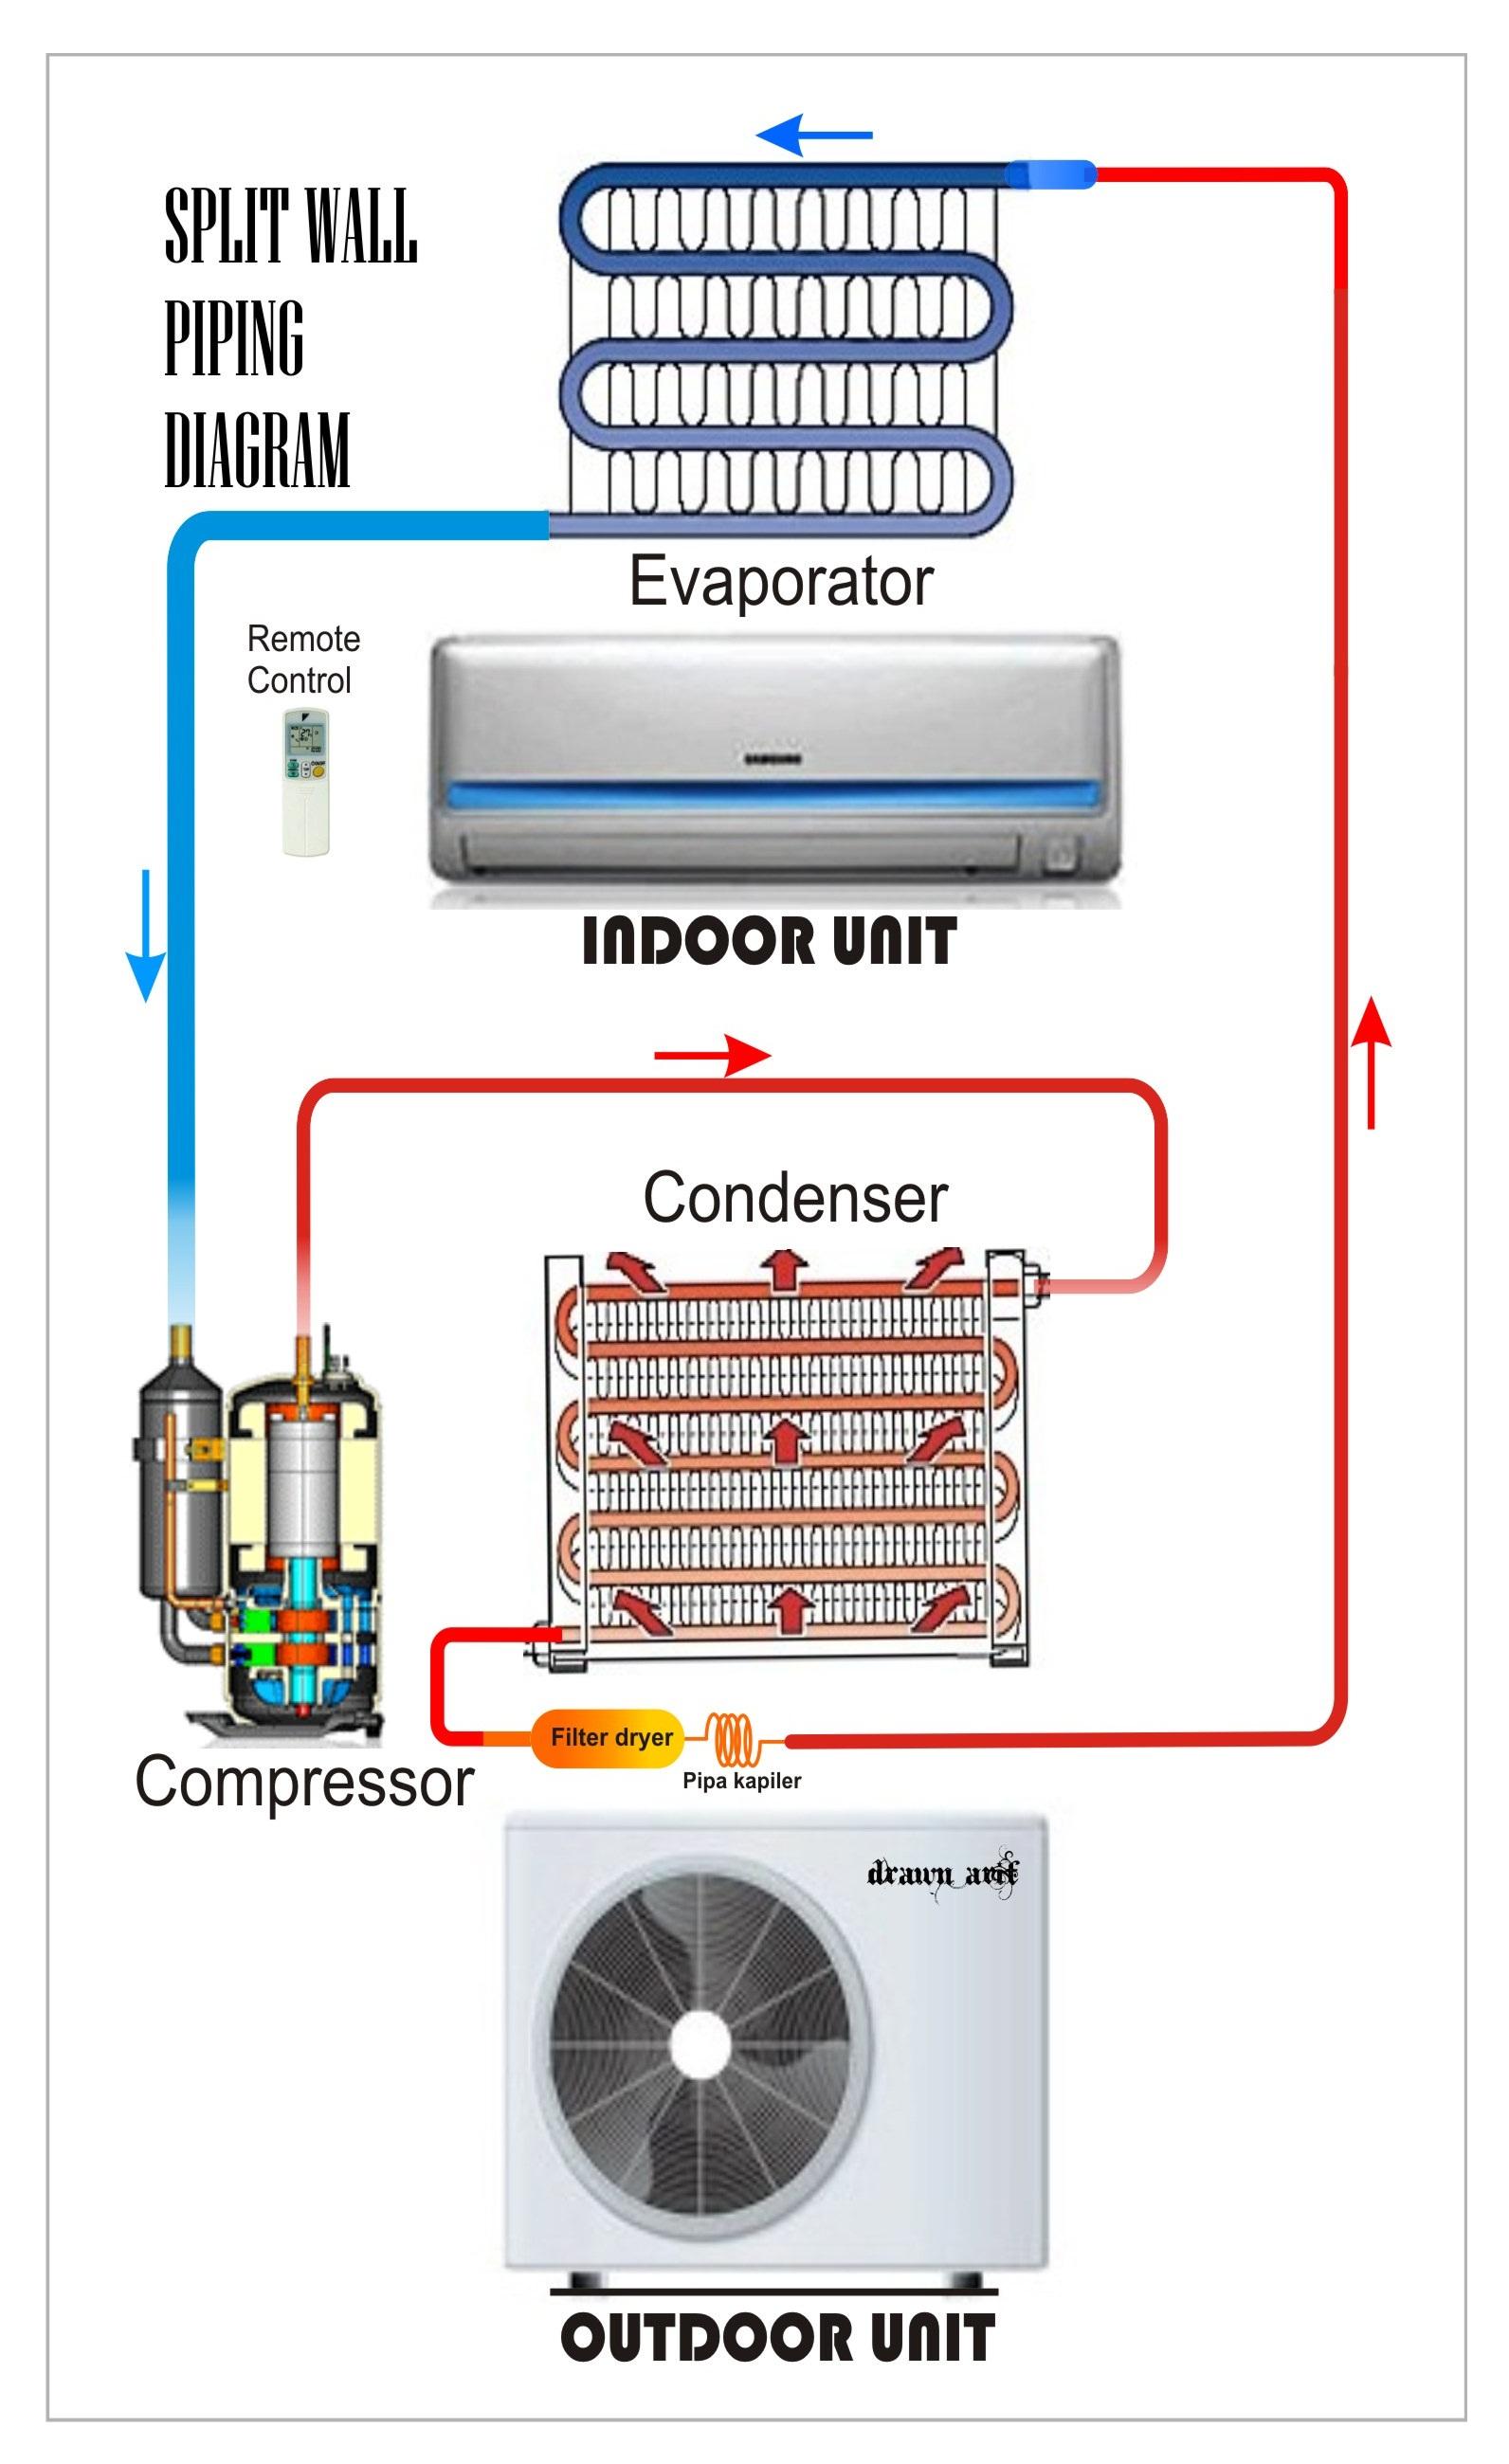 split wall piping diagram refrigeration air conditioning wiringsplit wall piping diagram refrigeration u0026 air conditioning [ 1592 x 2600 Pixel ]